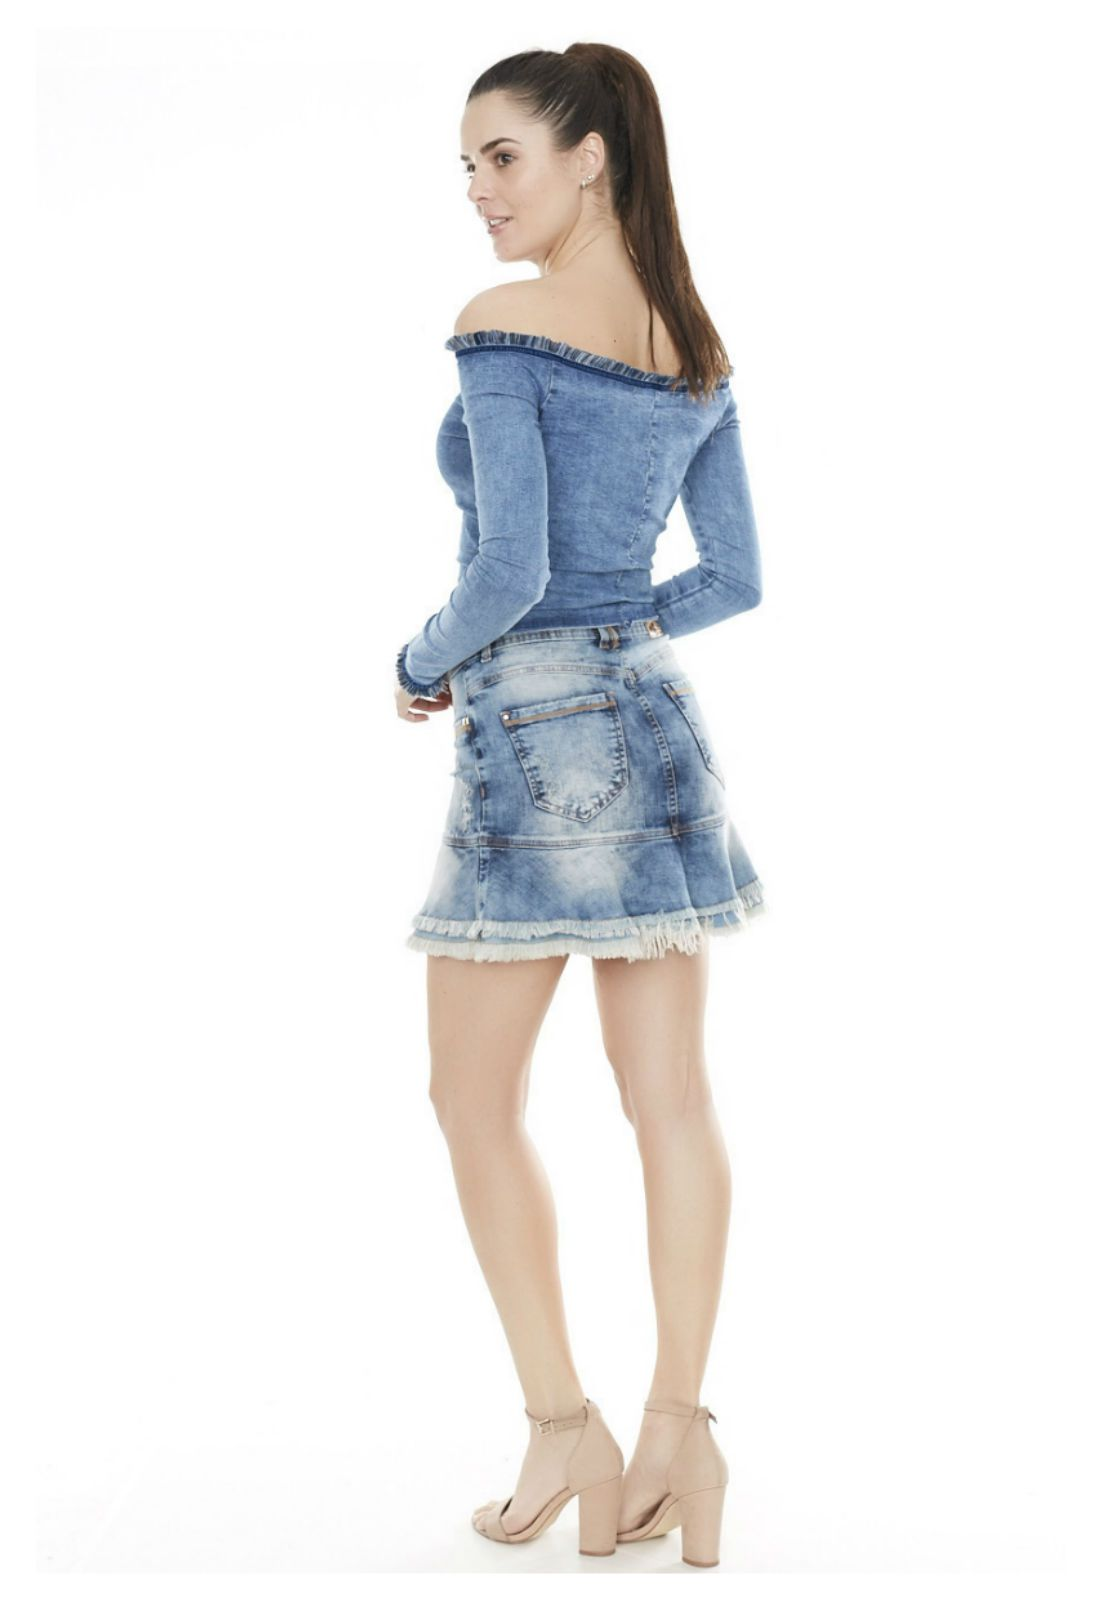 Blusa ombro a ombro jeans